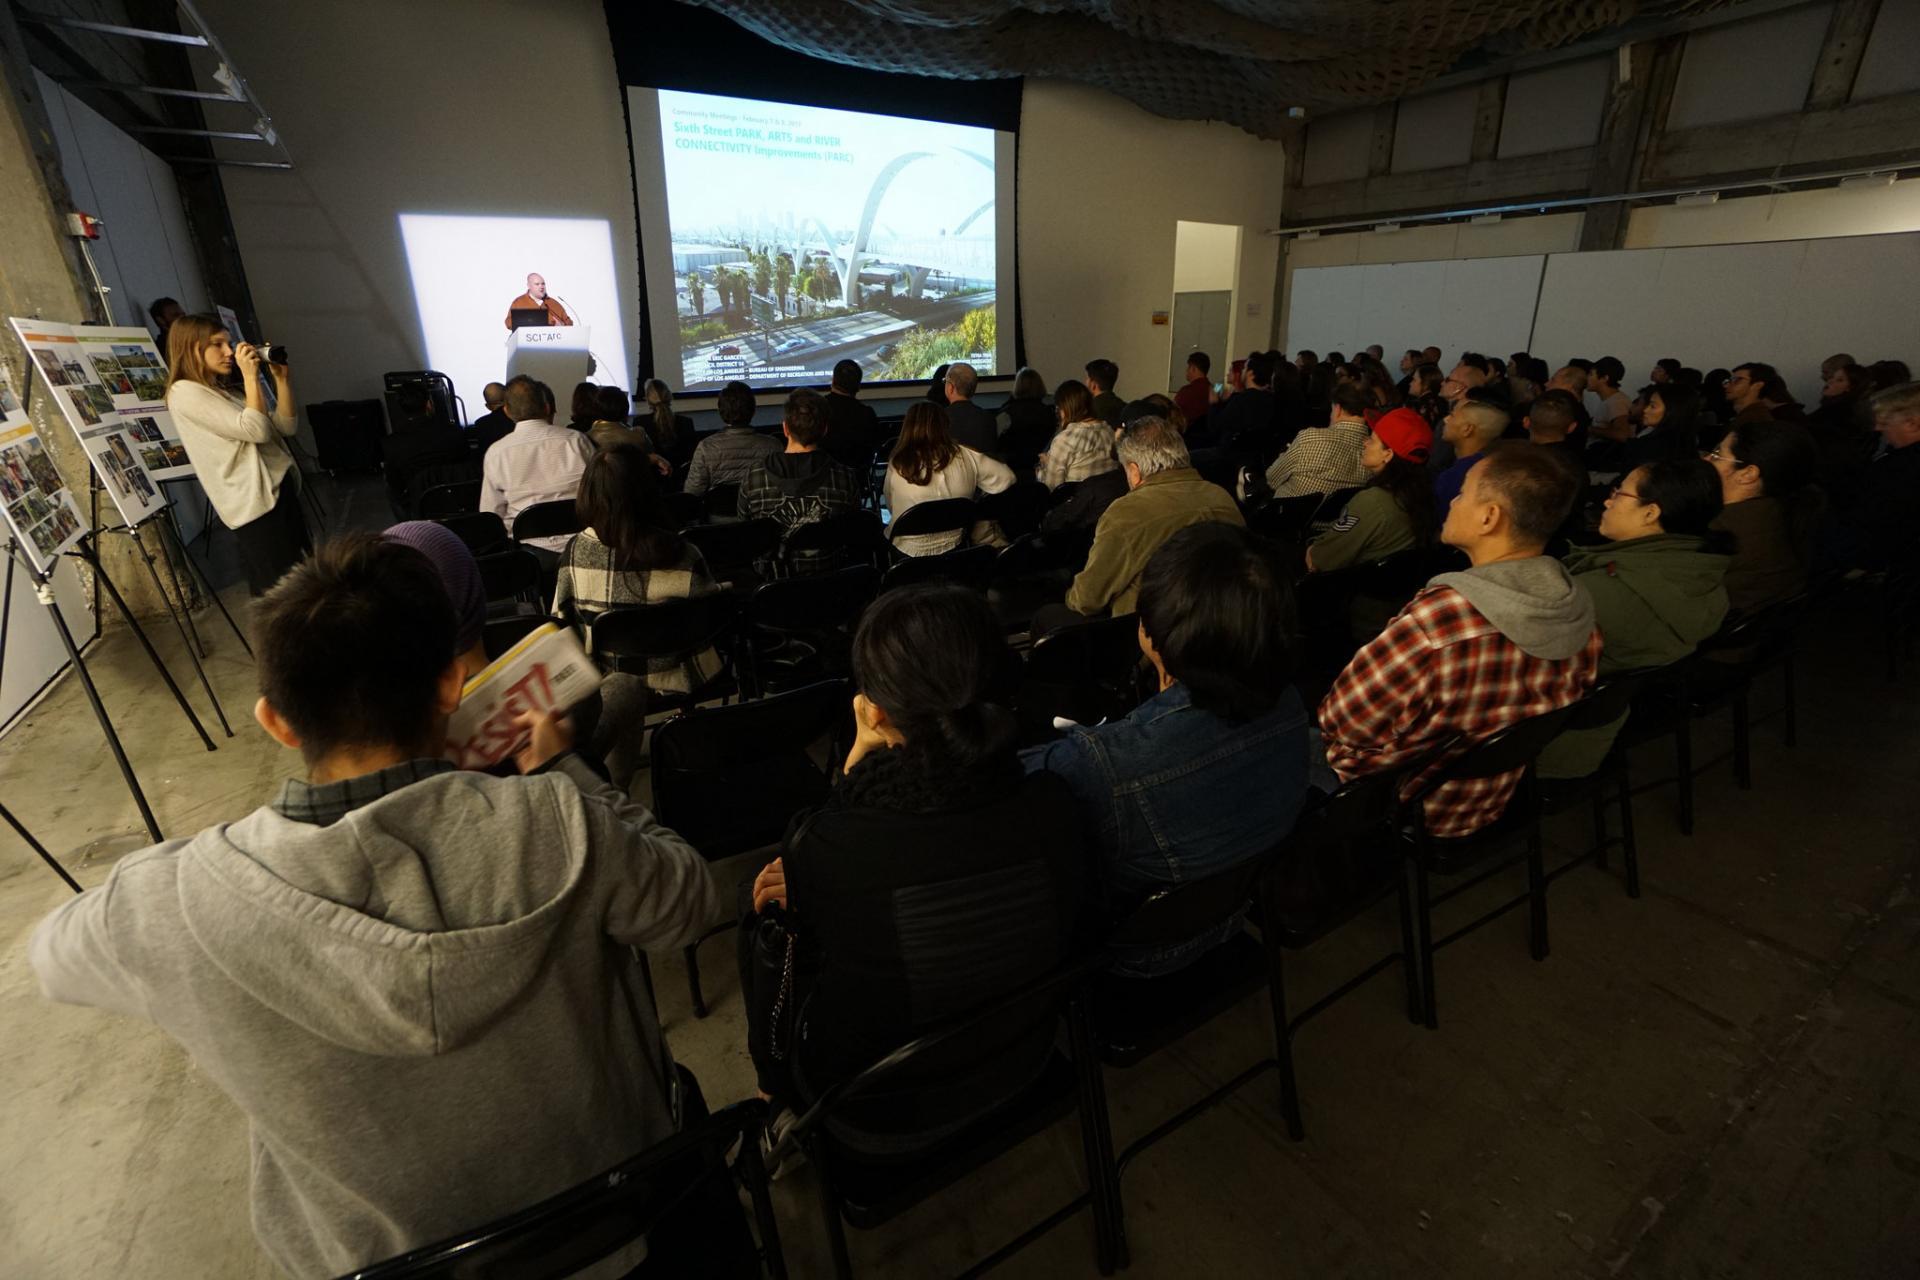 Photo of community members at a community meeting regarding the sixth street viaduct